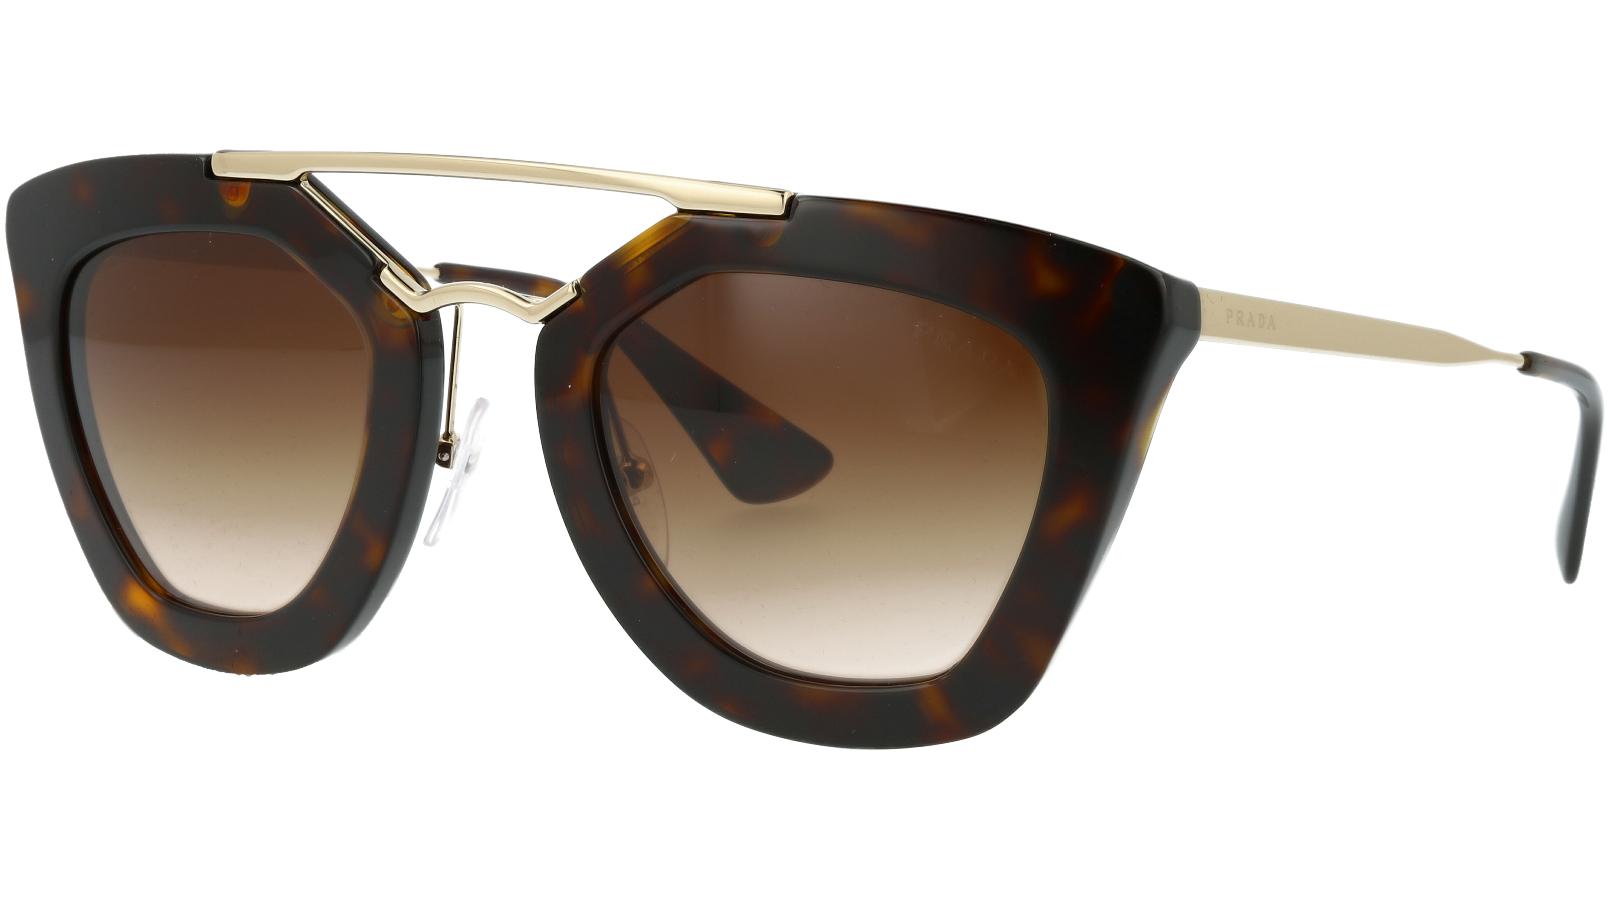 PRADA PR09QS 2AU6S1 49 HAVANA Sunglasses